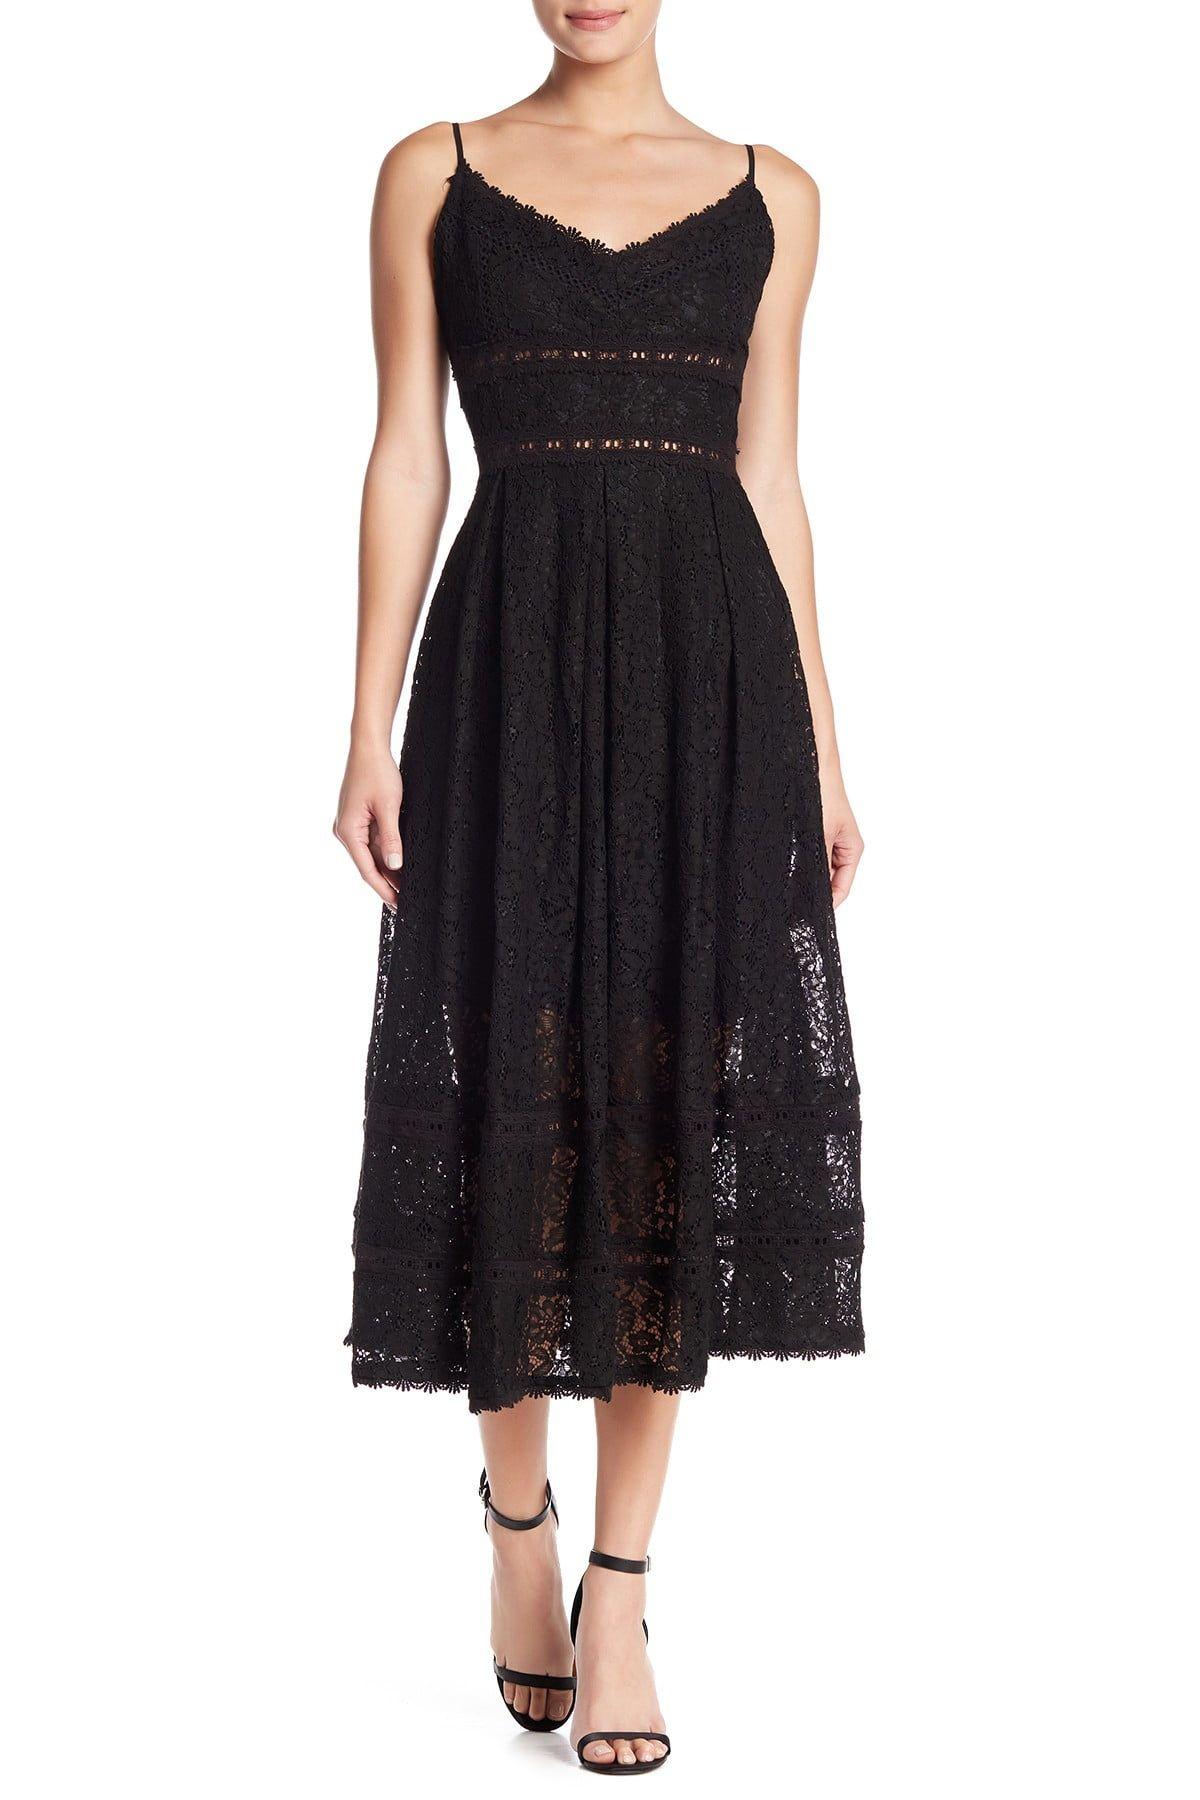 Nsr Sleeveless Lace Midi Dress Nordstrom Rack In 2021 Black Lace Midi Dress Lace Midi Dress Midi Dress [ 1800 x 1200 Pixel ]